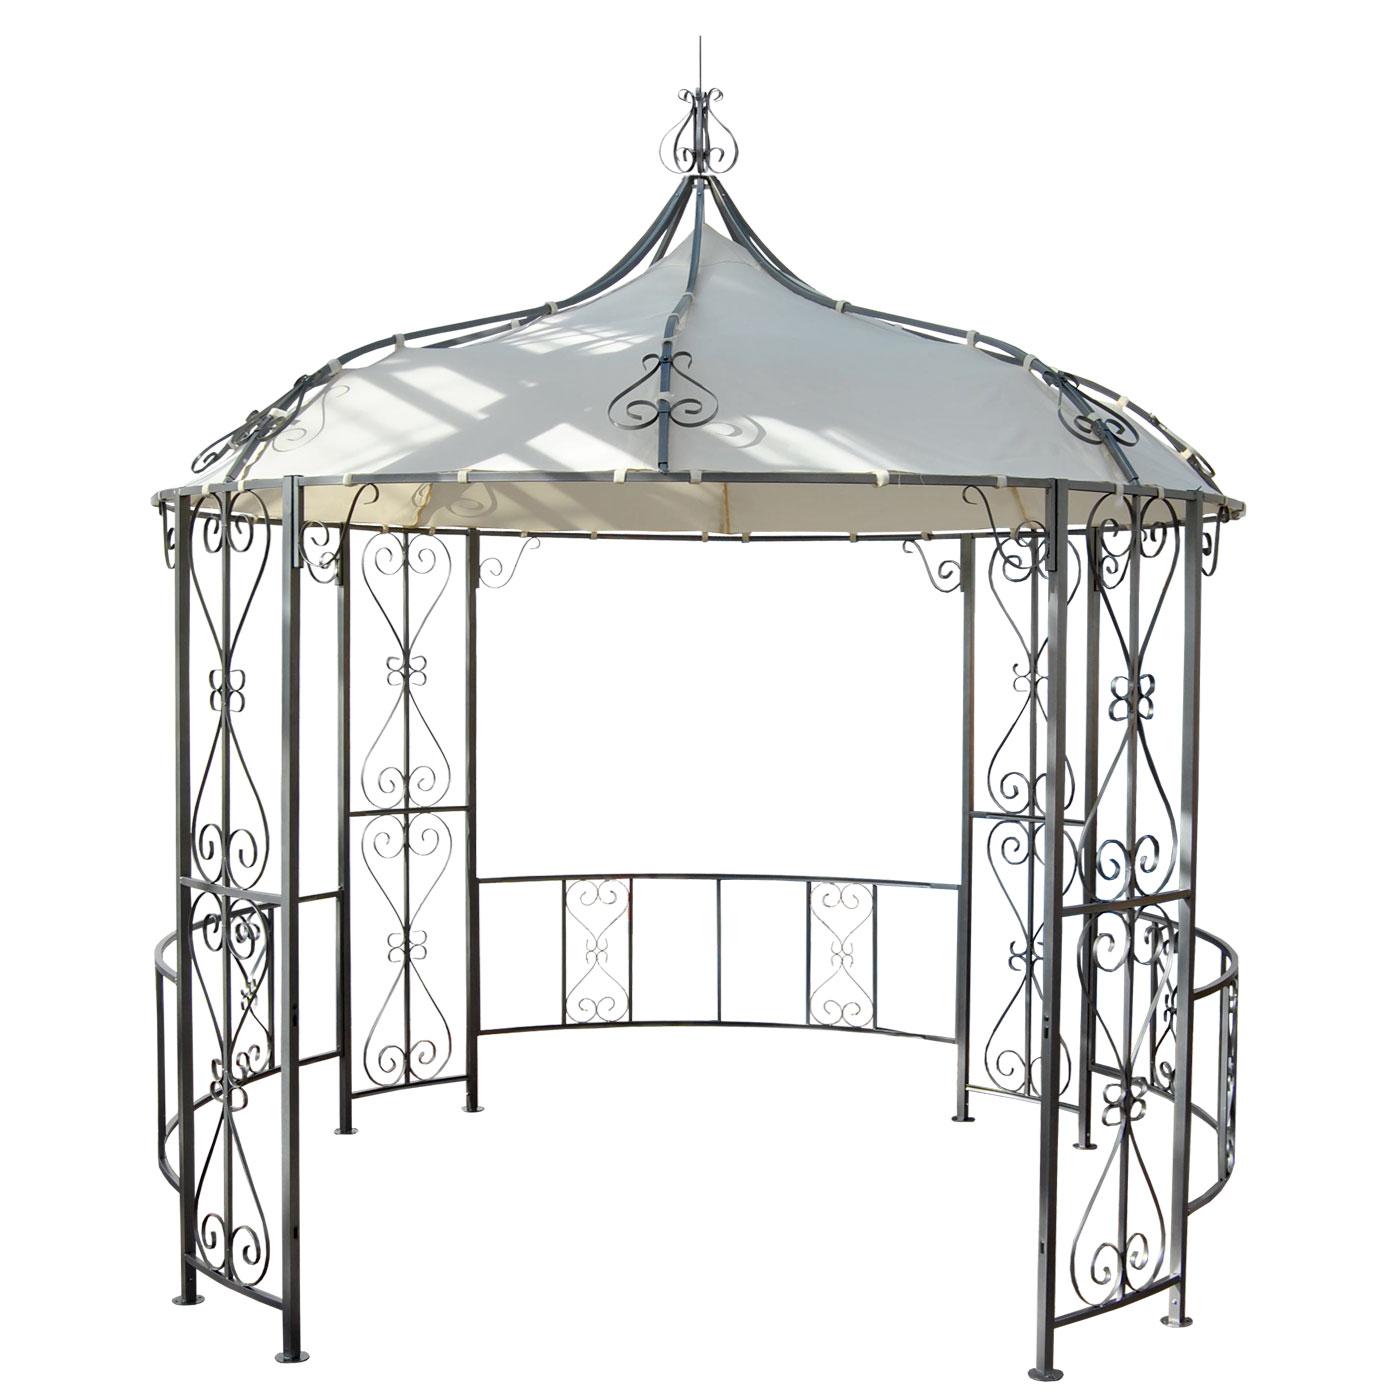 pergola almeria rundpavillon garten pavillon stabiles stahl gestell 3m ebay. Black Bedroom Furniture Sets. Home Design Ideas